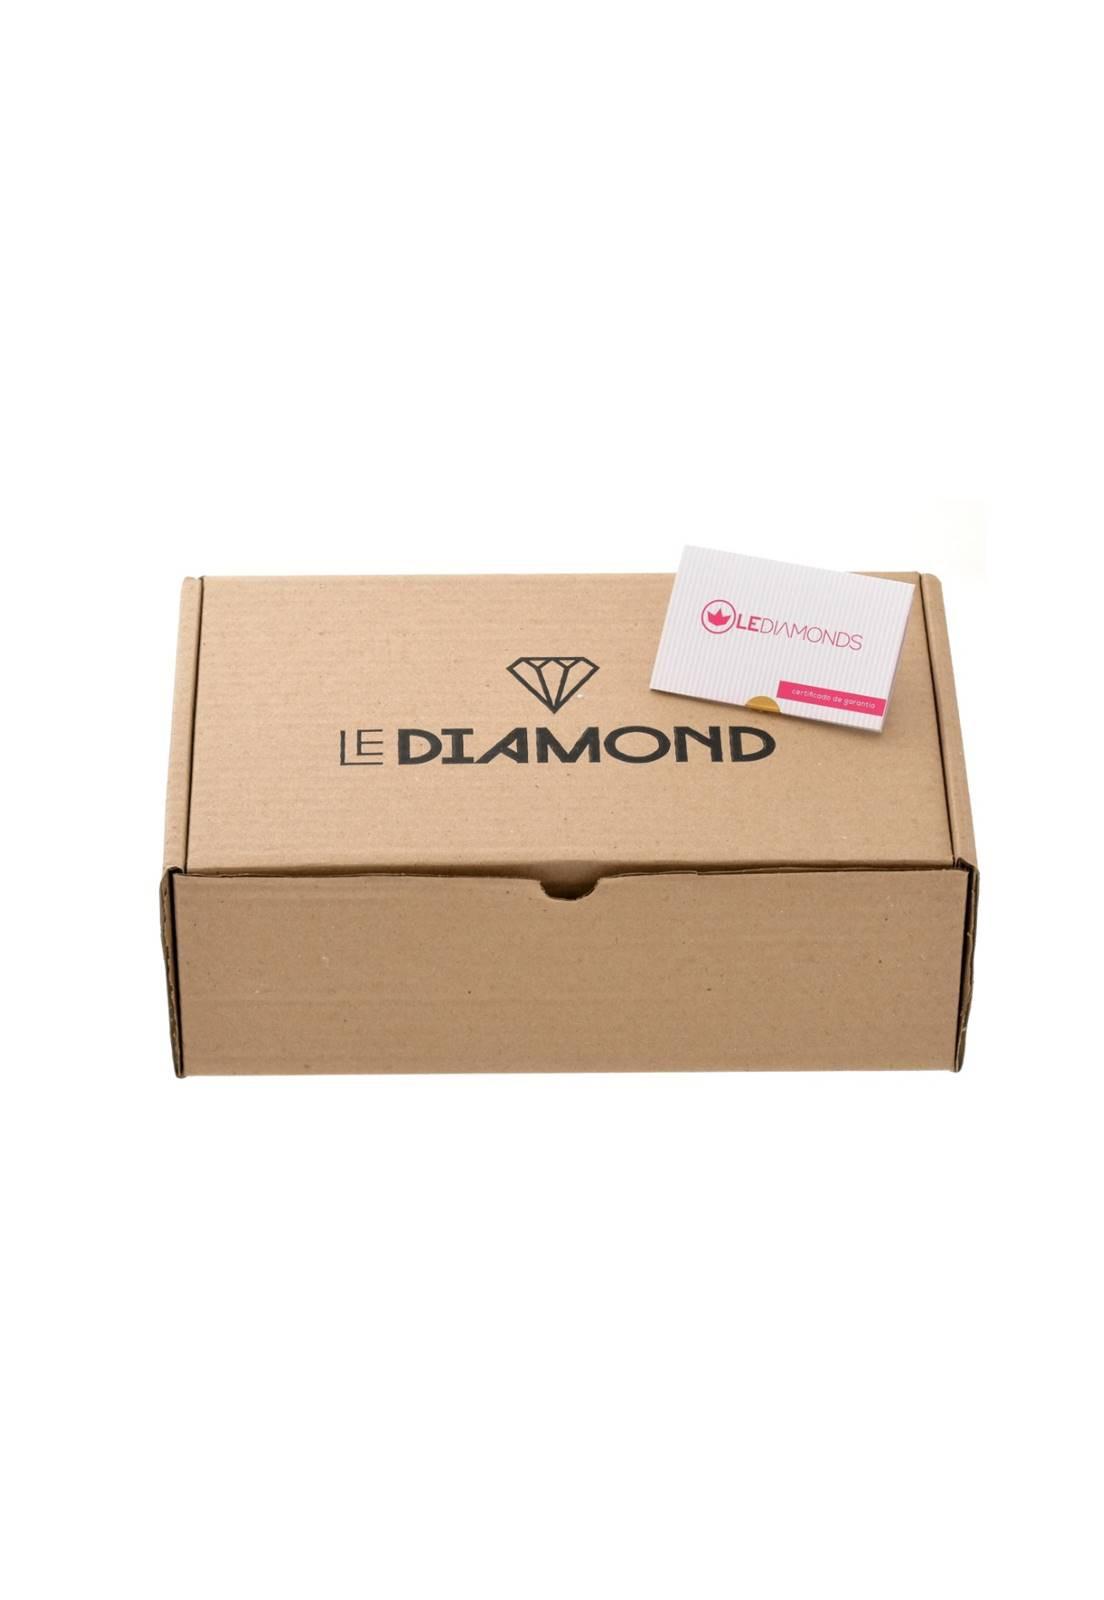 Colar Choker Le Diamondu com Aro Dourado